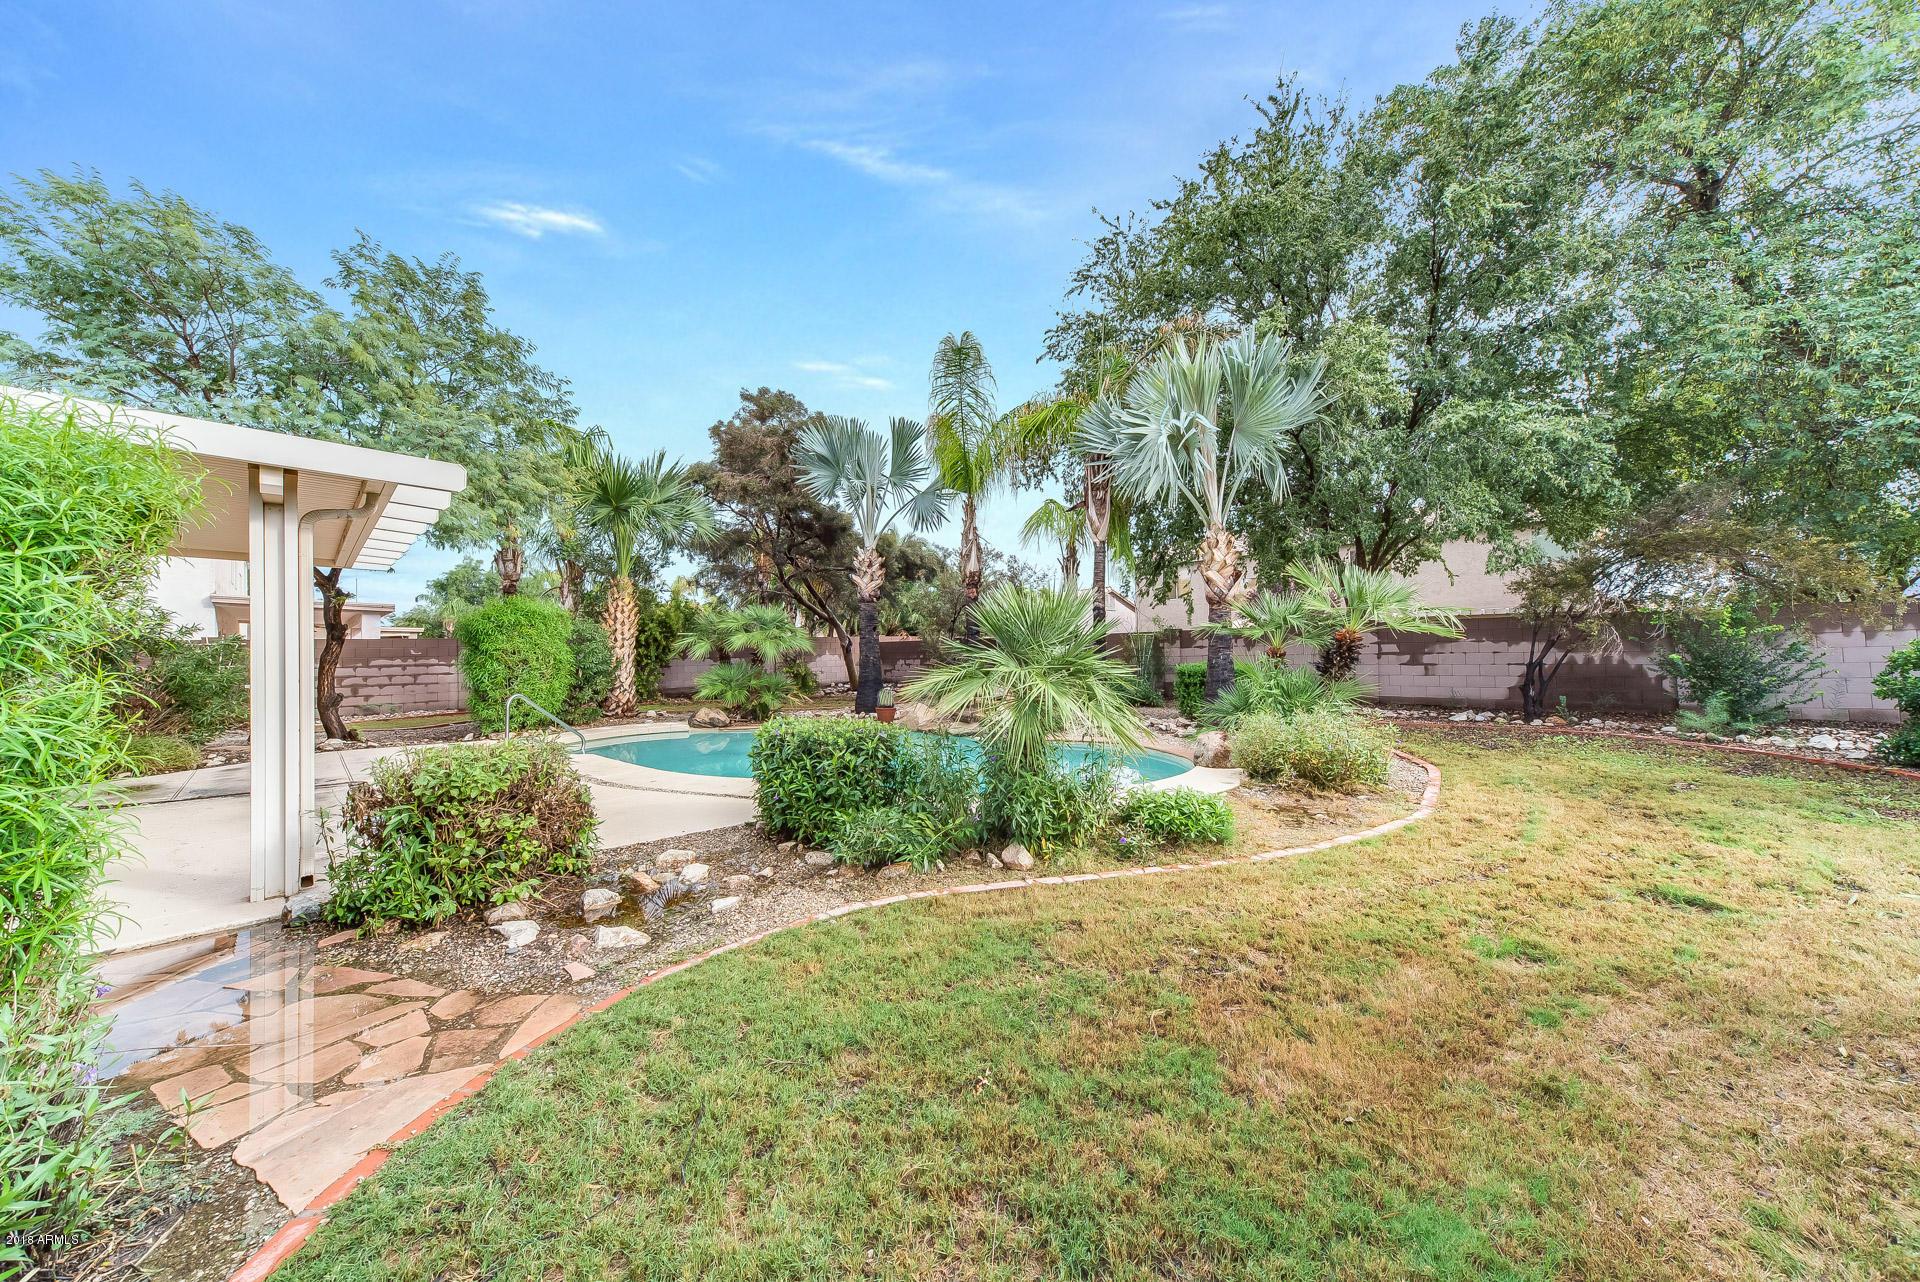 MLS 5833369 1205 E SAN CARLOS Way, Chandler, AZ 85249 Chandler AZ Chandler Heights Estates